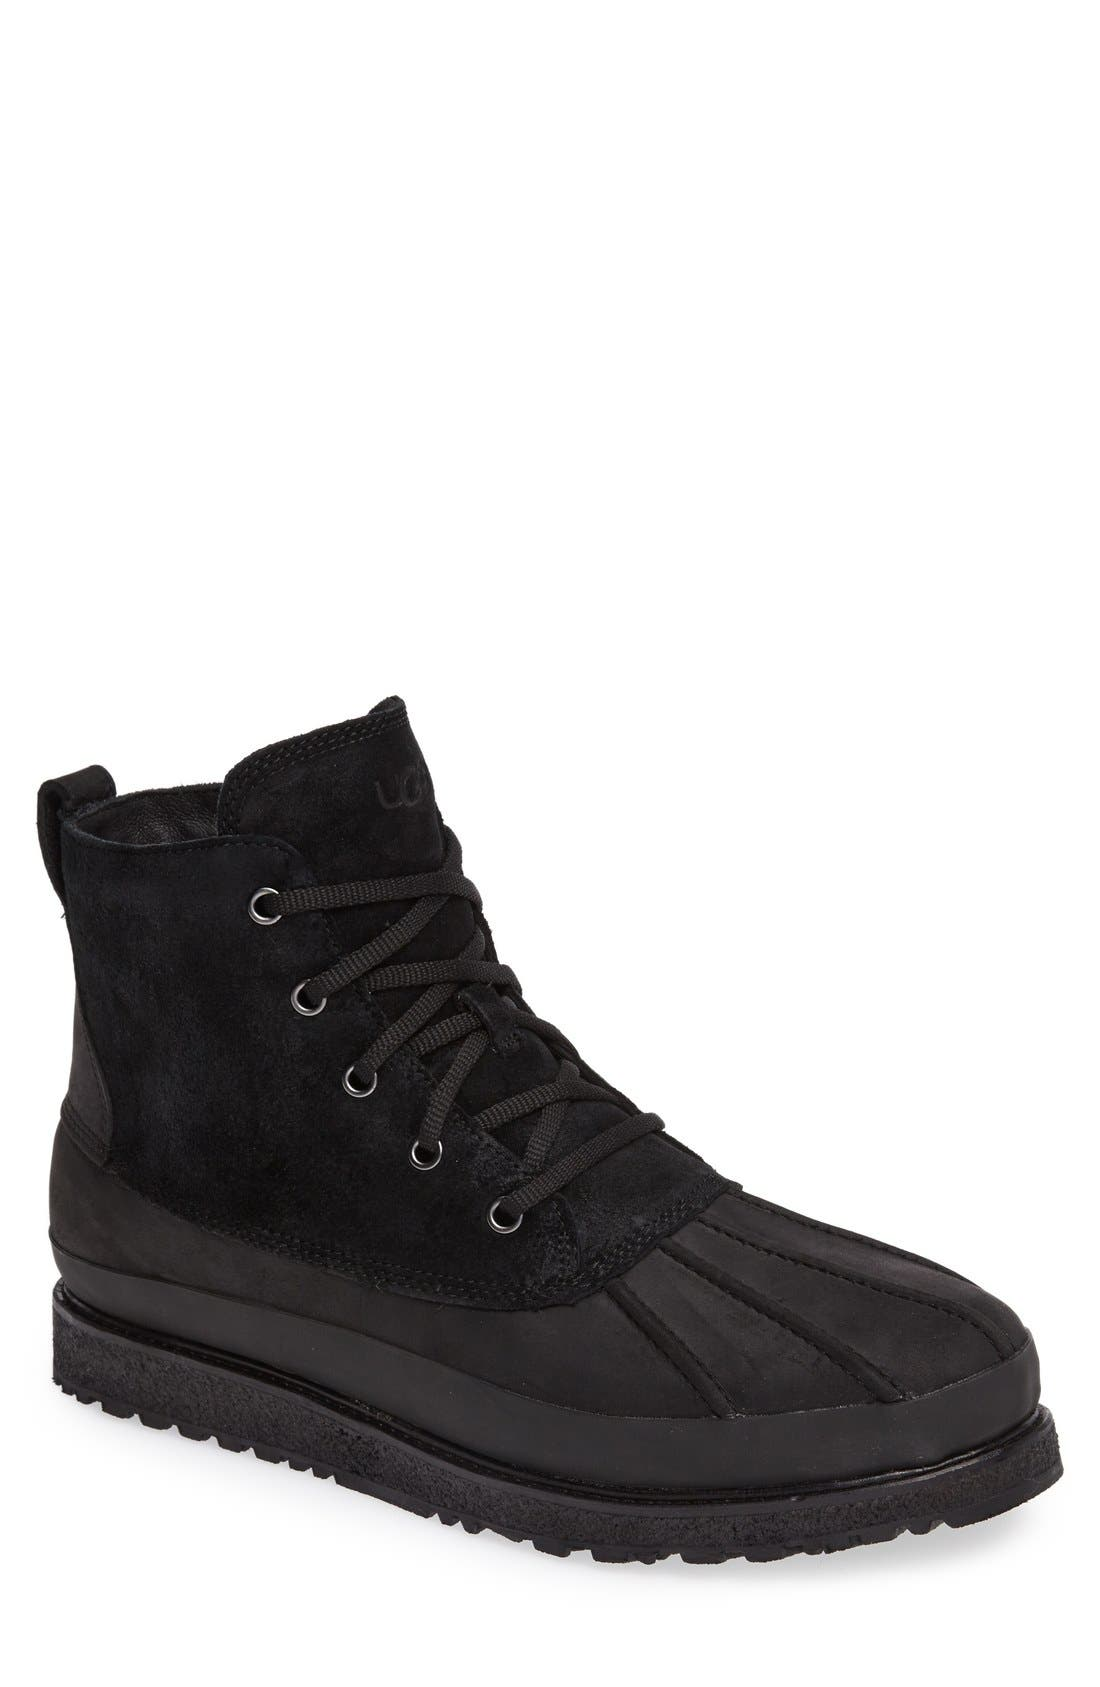 Main Image - UGG® Fairbanks Waterproof Boot (Men)